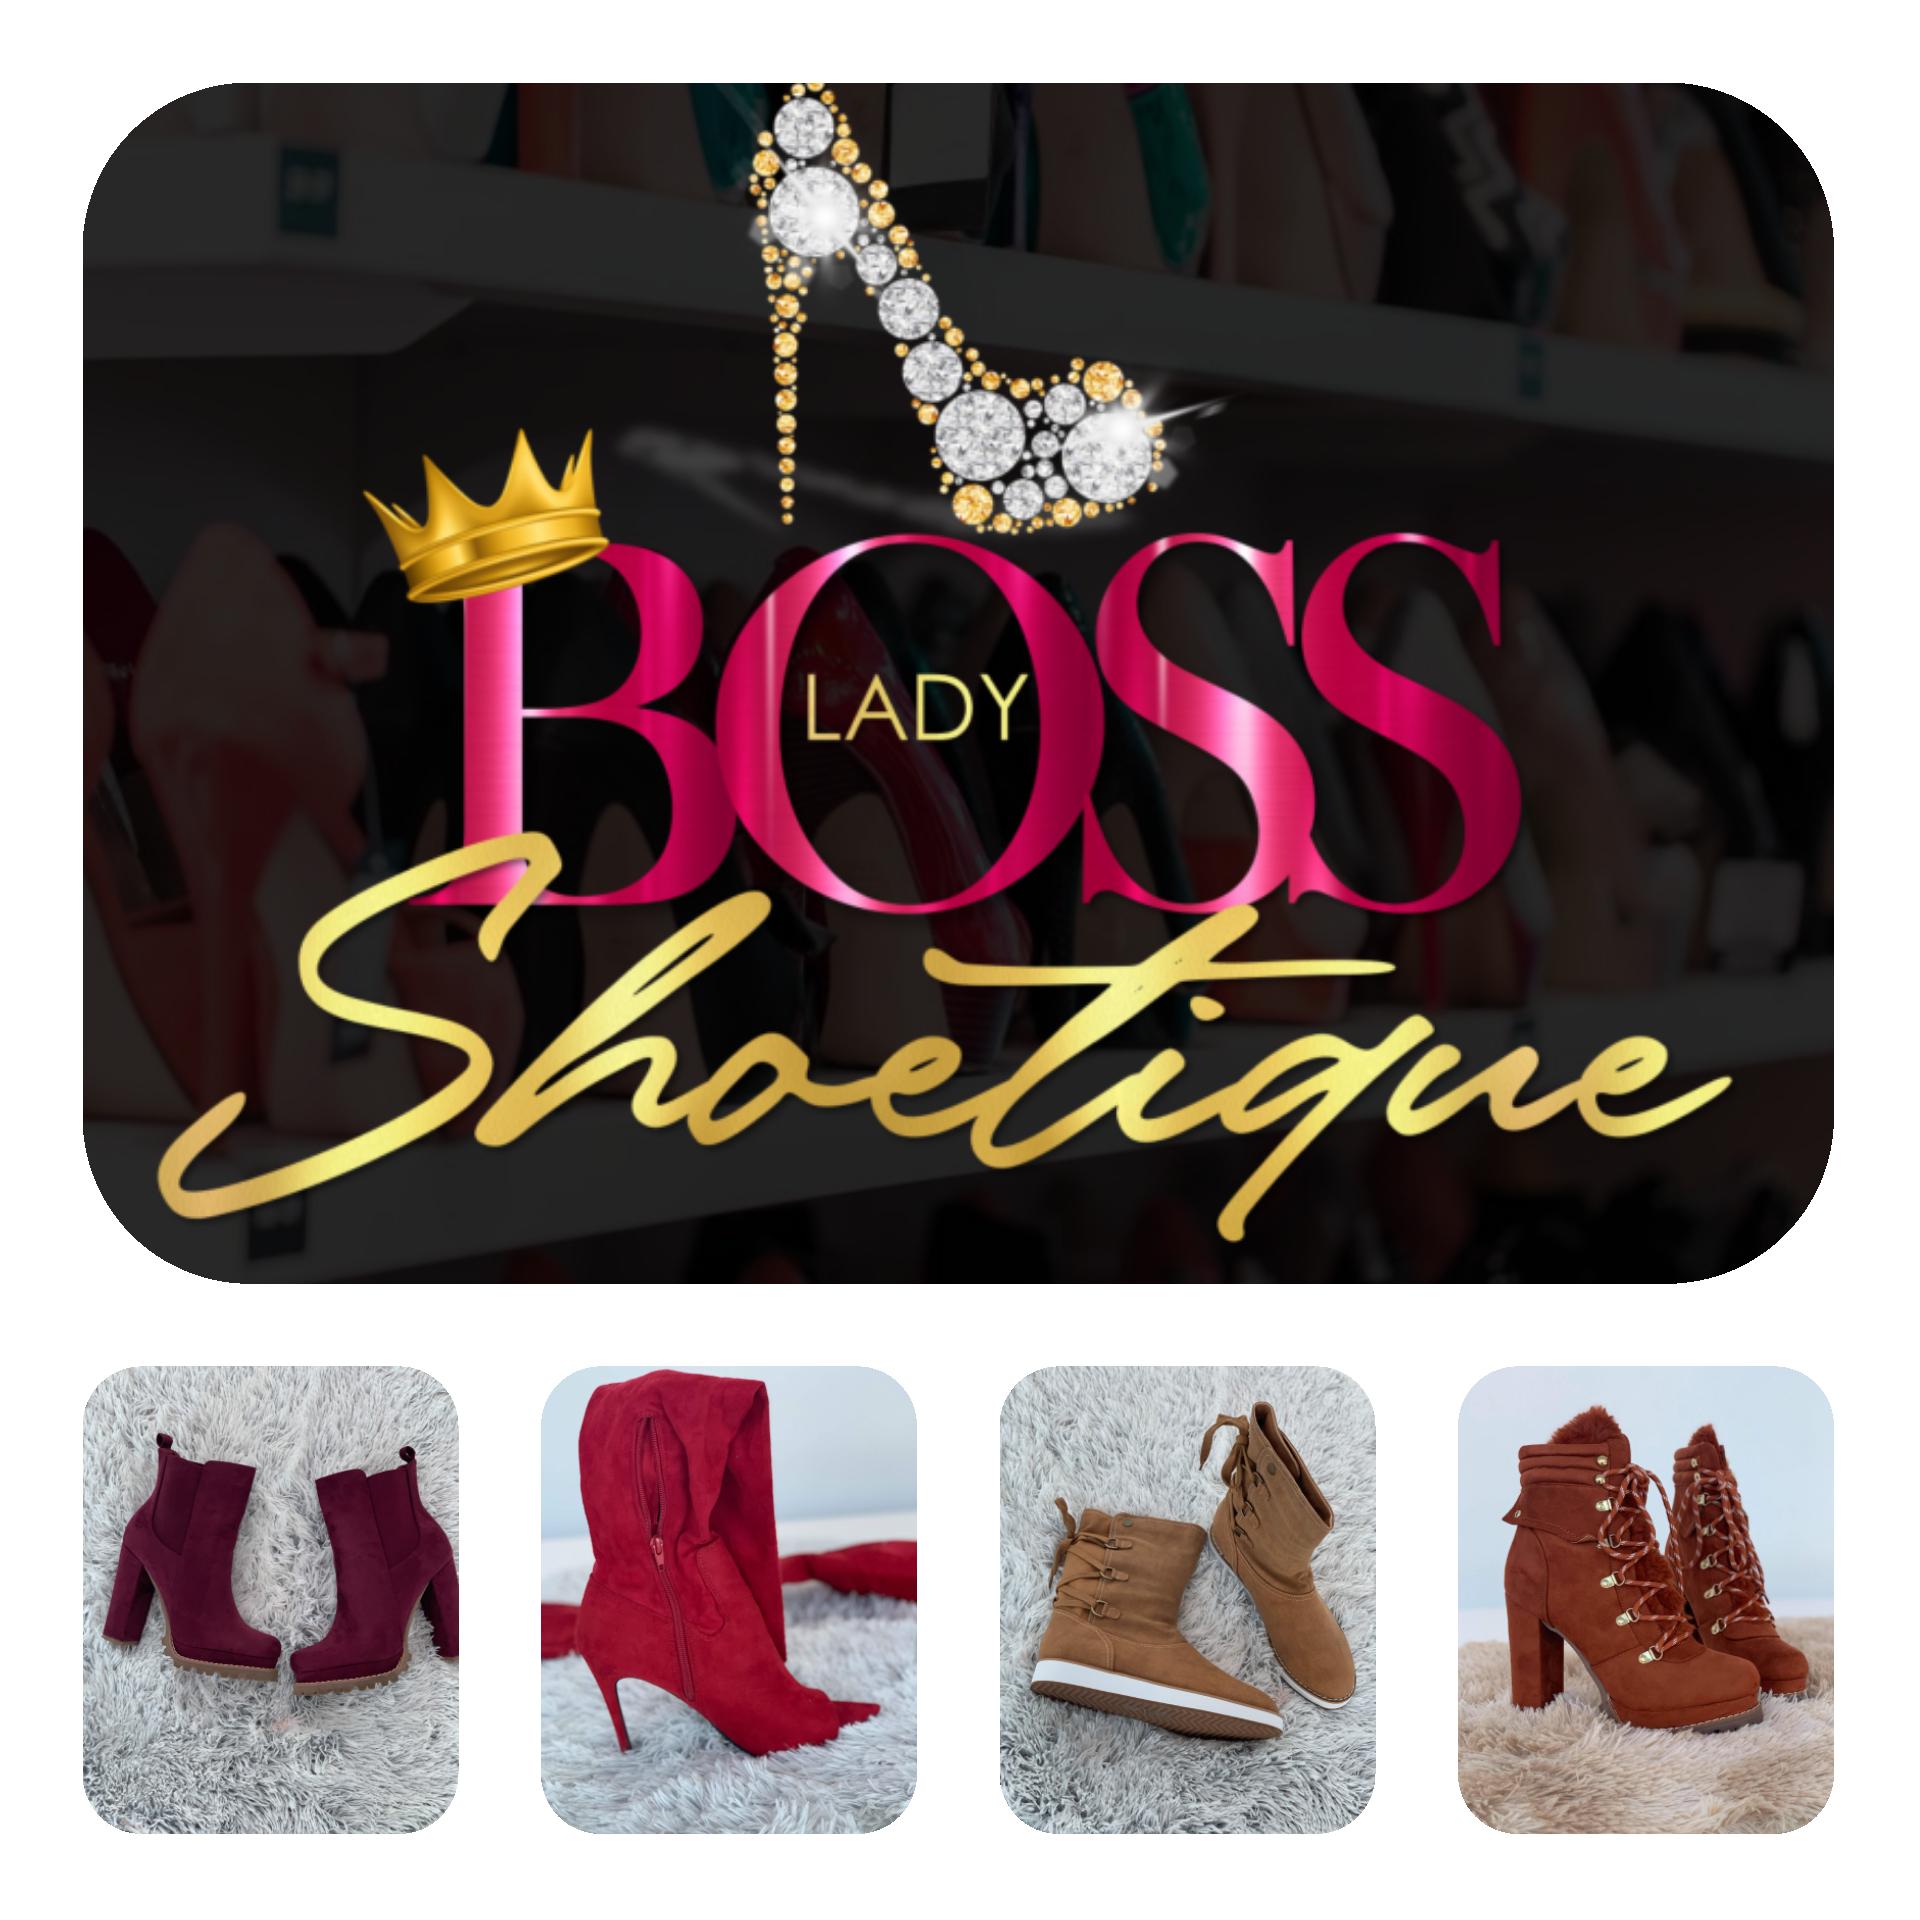 BossLadyShoetique